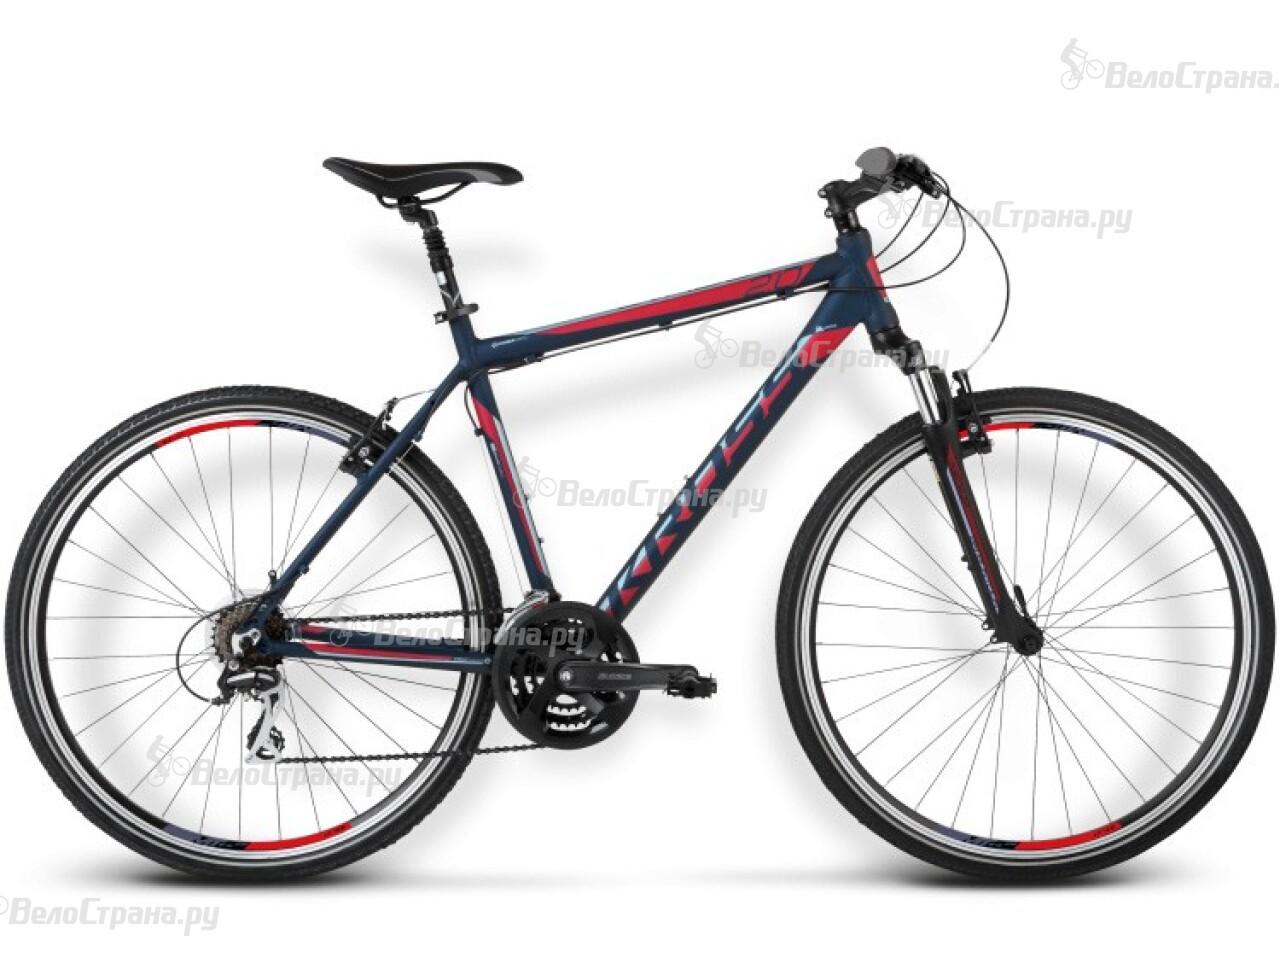 Велосипед Kross EVADO 2.0 (2016) велосипед kross evado 6 0 2016